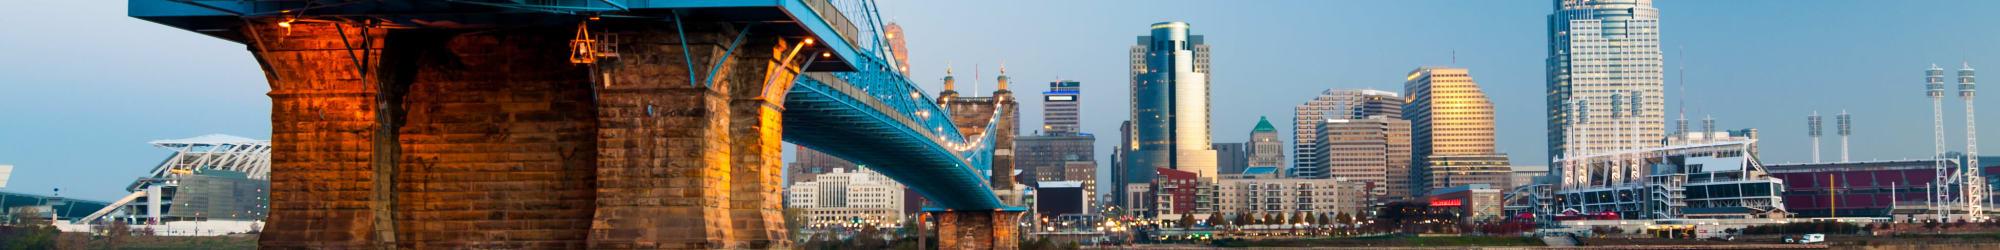 Directions to Echelon Luxury Apartments in Cincinnati, Ohio